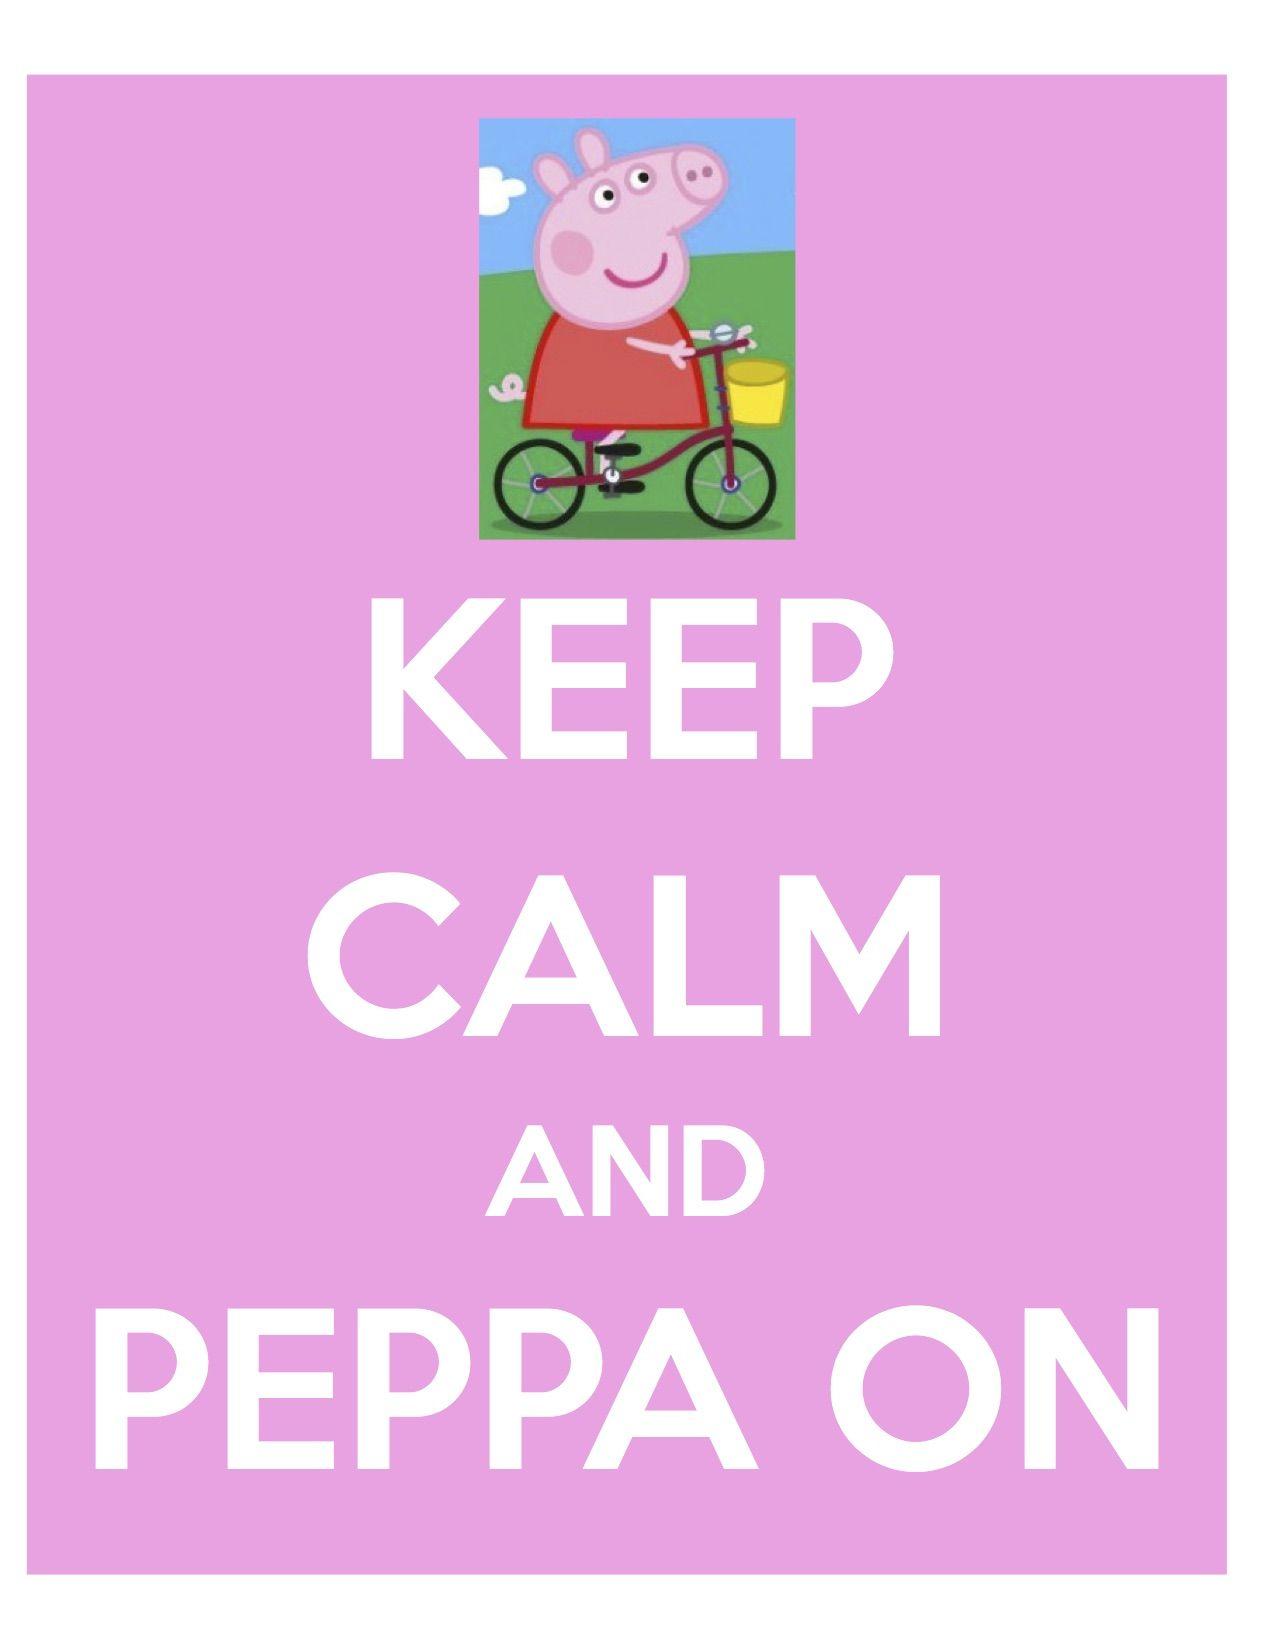 A Mostly Diy Peppa Pig Party Peppa Pig Memes Peppa Pig Funny Peppa Pig Wallpaper